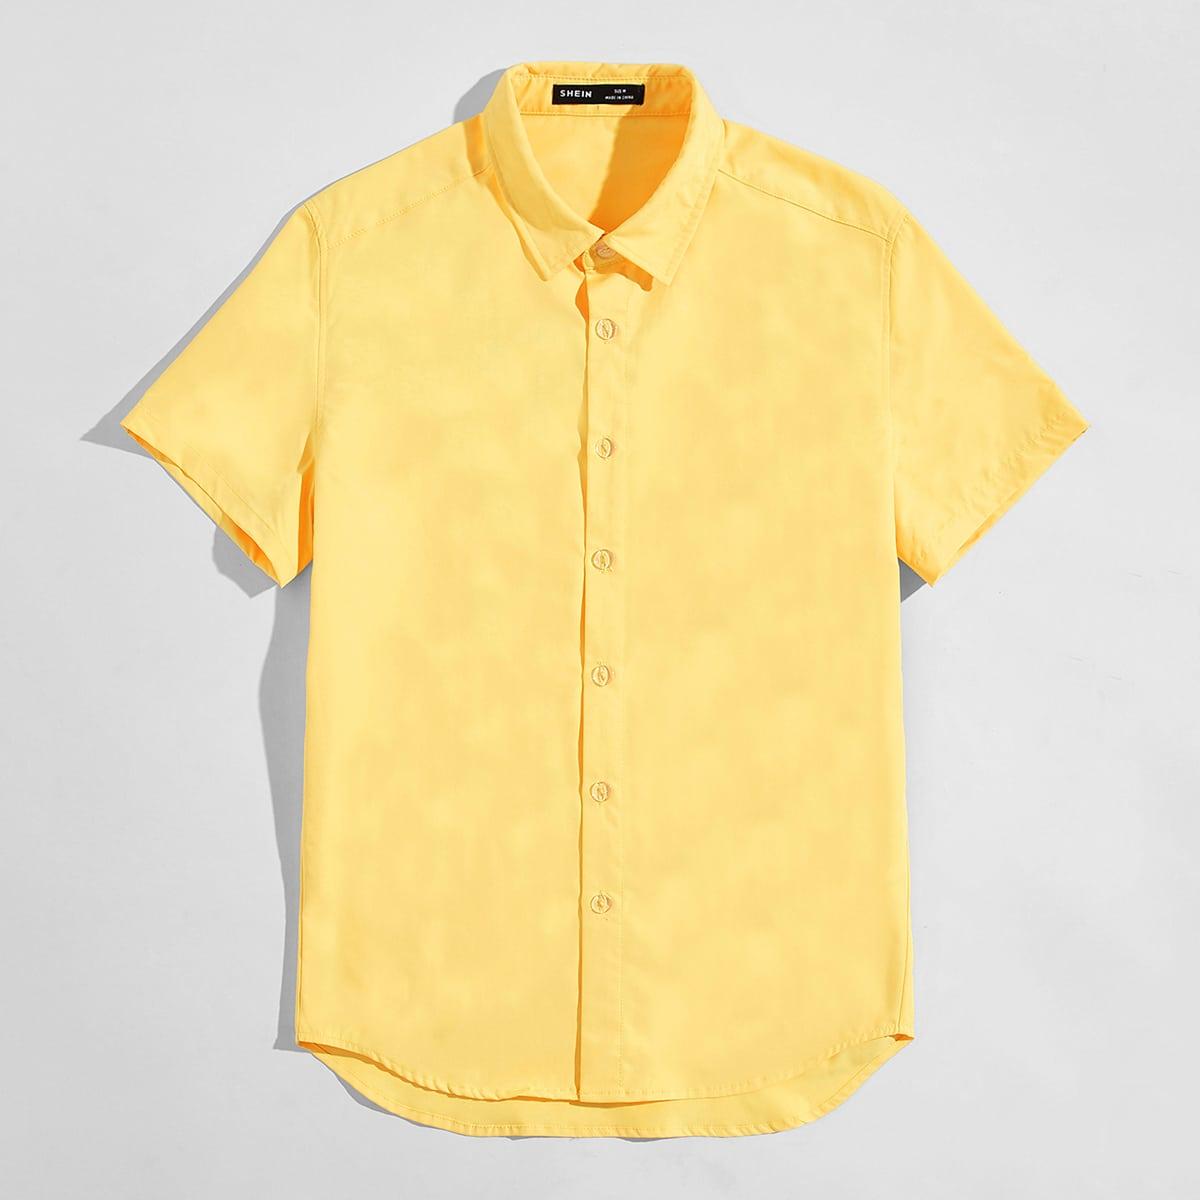 Мужская рубашка по цене 791